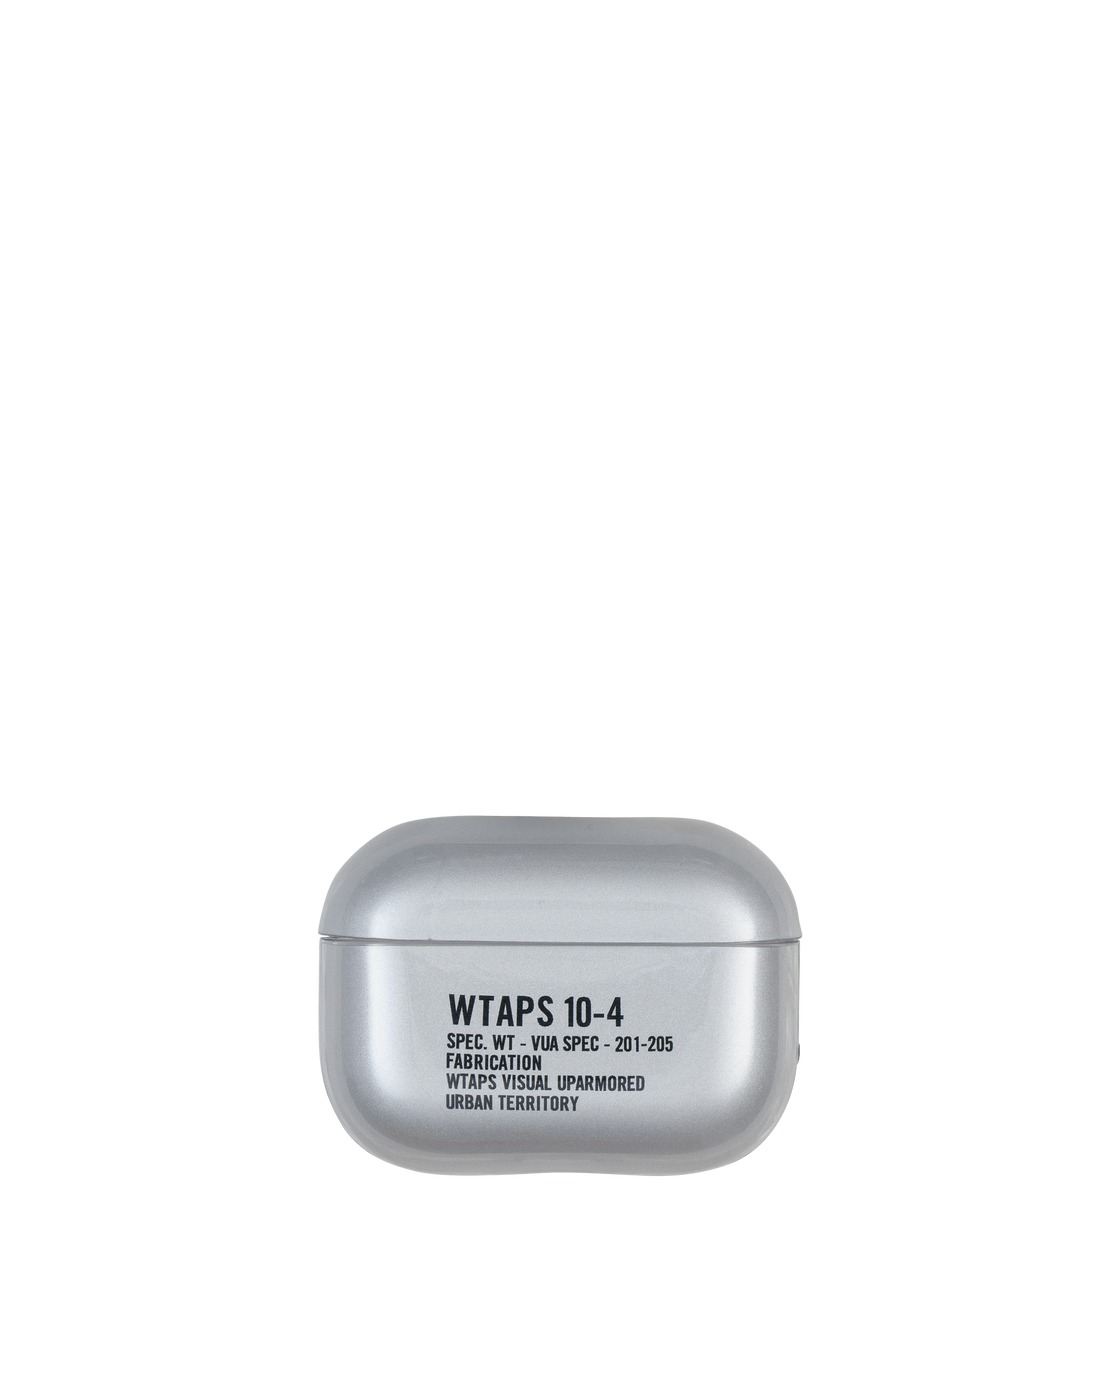 Photo: Wtaps 10 4 Airpods Pro Case Silver